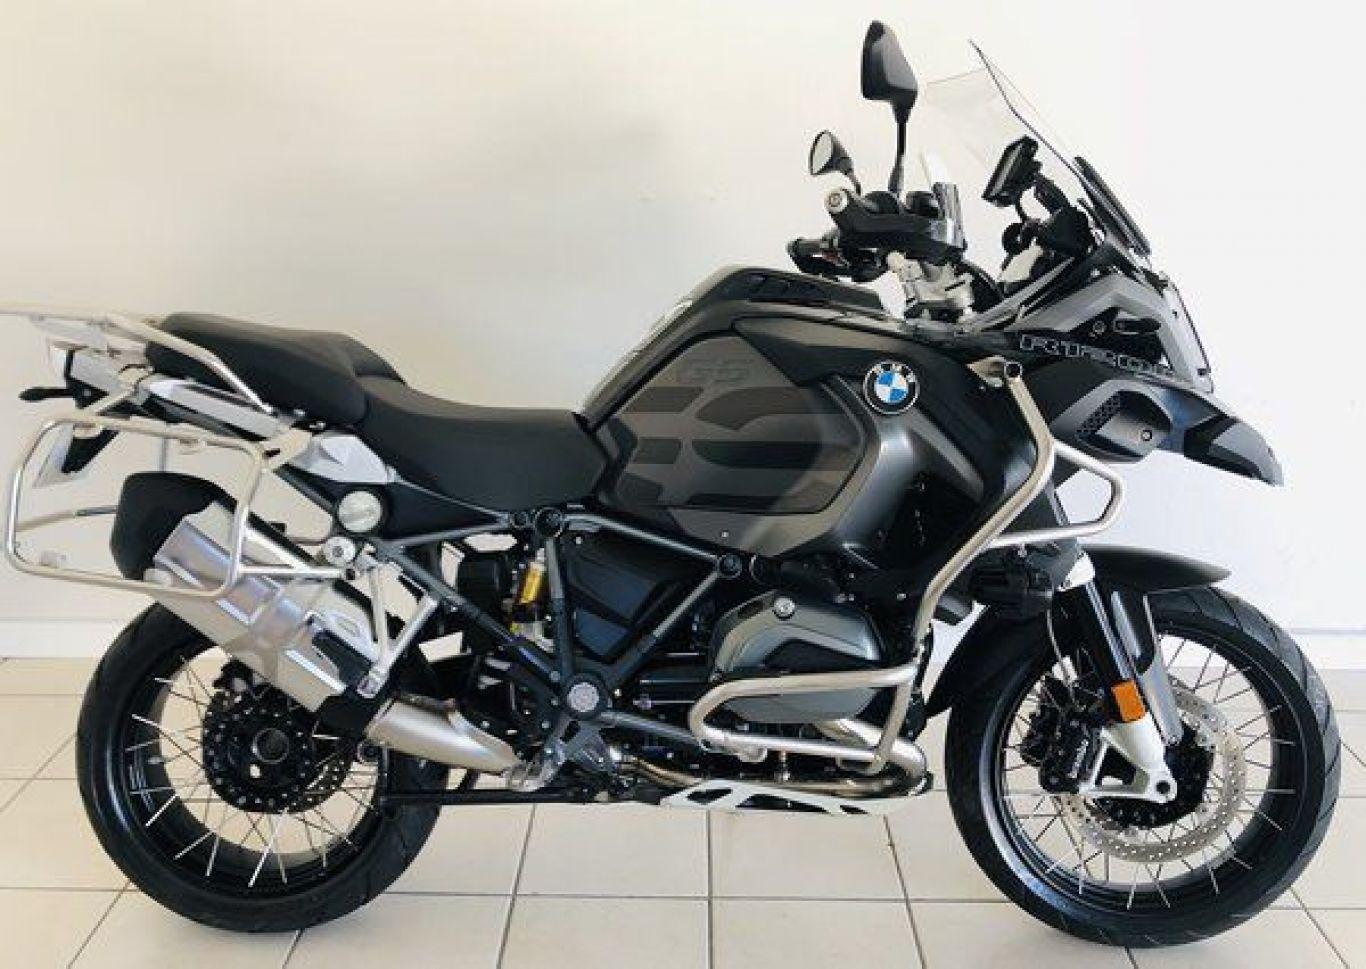 2016 BMW Motorcycle Updates Include R1200GS TripleBlack